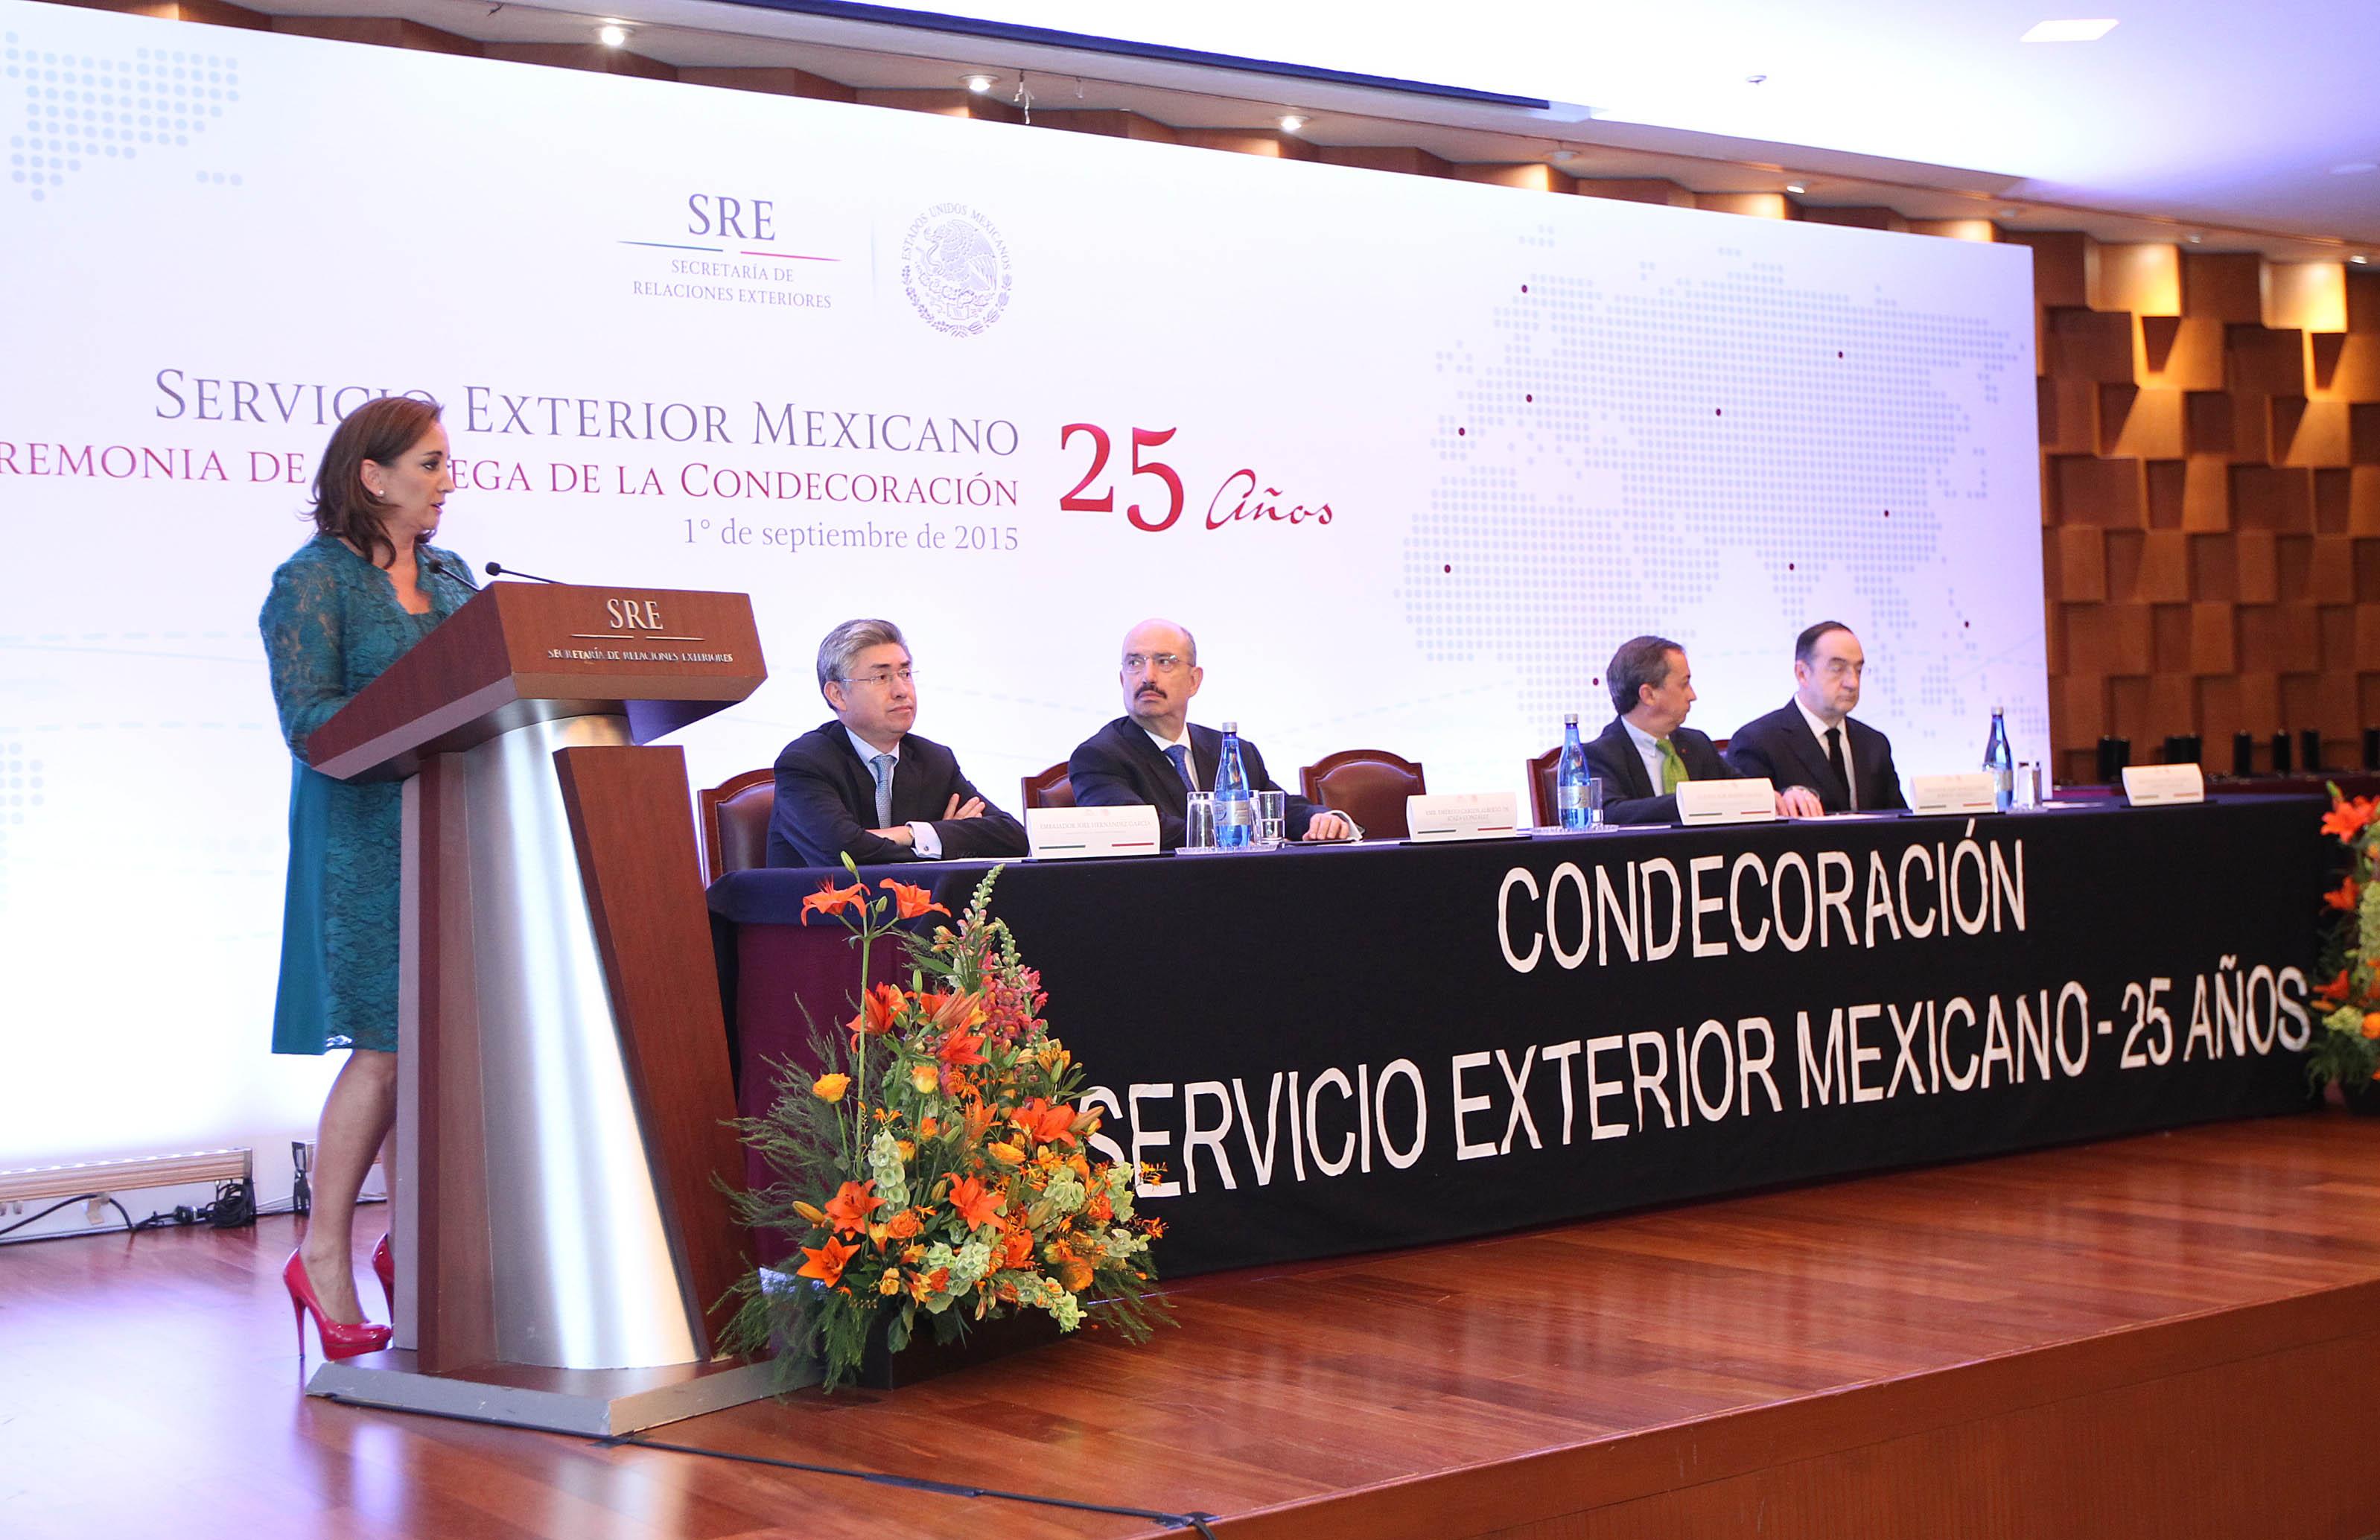 FOTO 2 La canciller Claudia Ruiz Massieu entreg  condecoraciones por 25 a os de servicio a integrantes del SEM.jpg